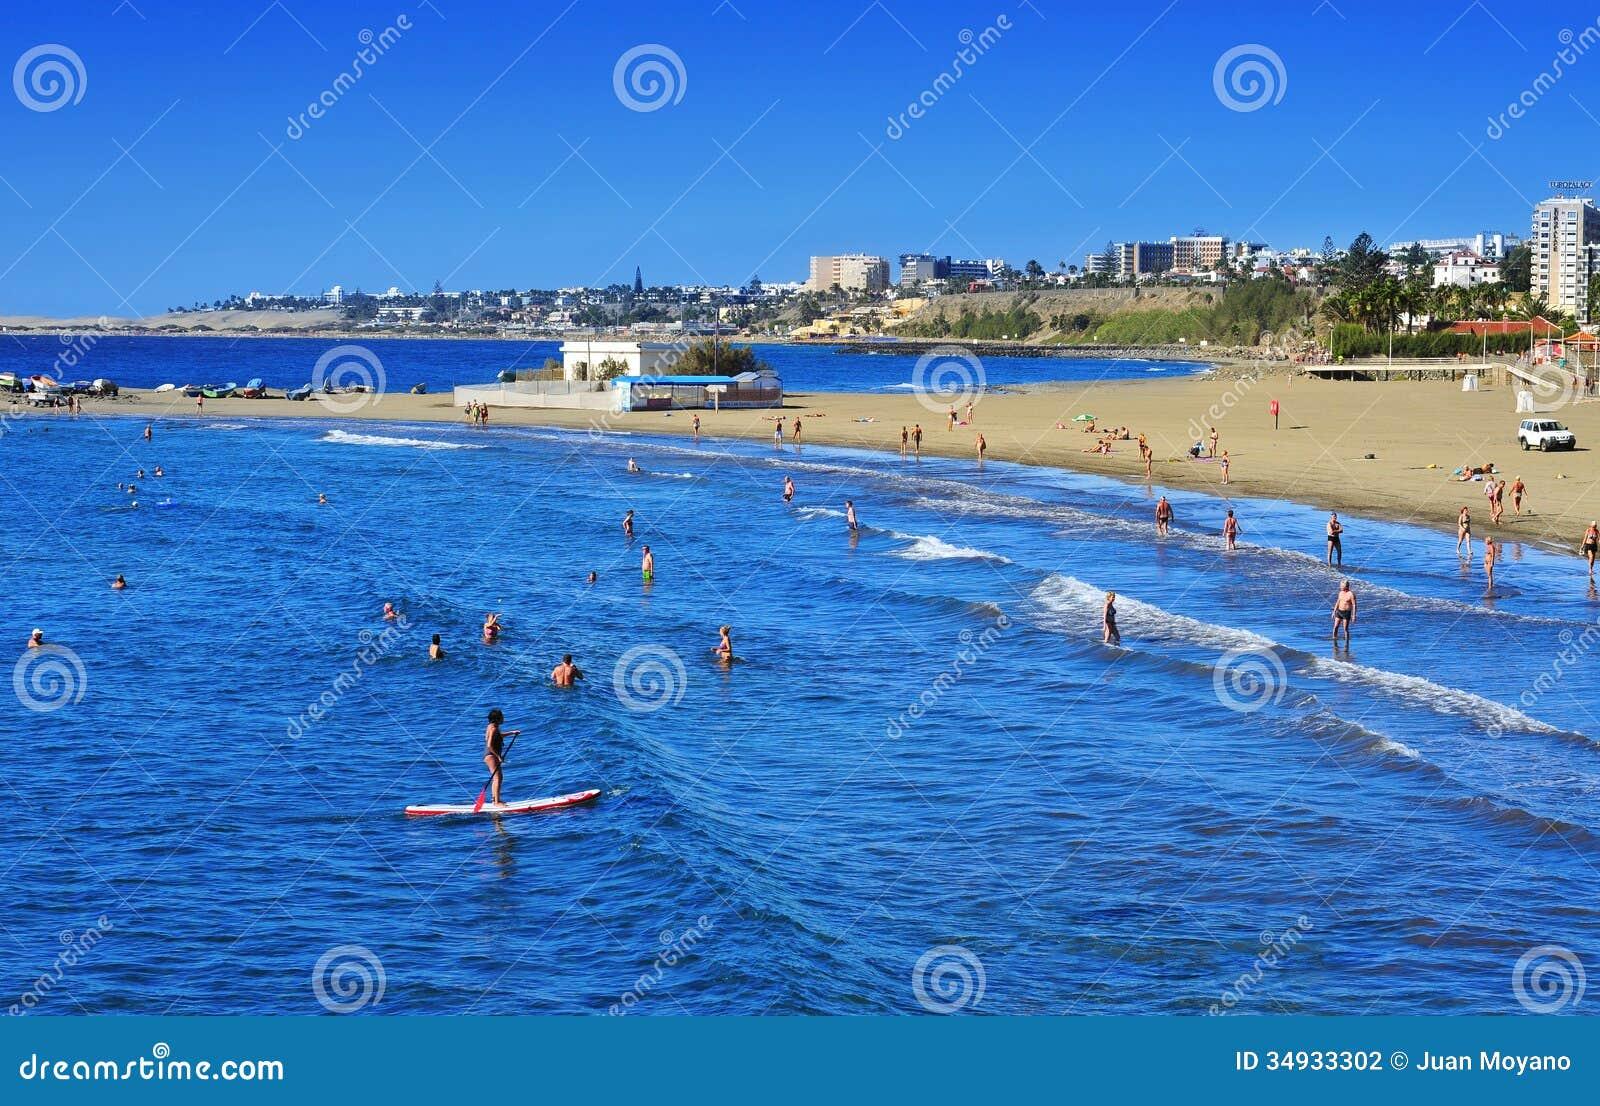 playa de maspalomas watersports